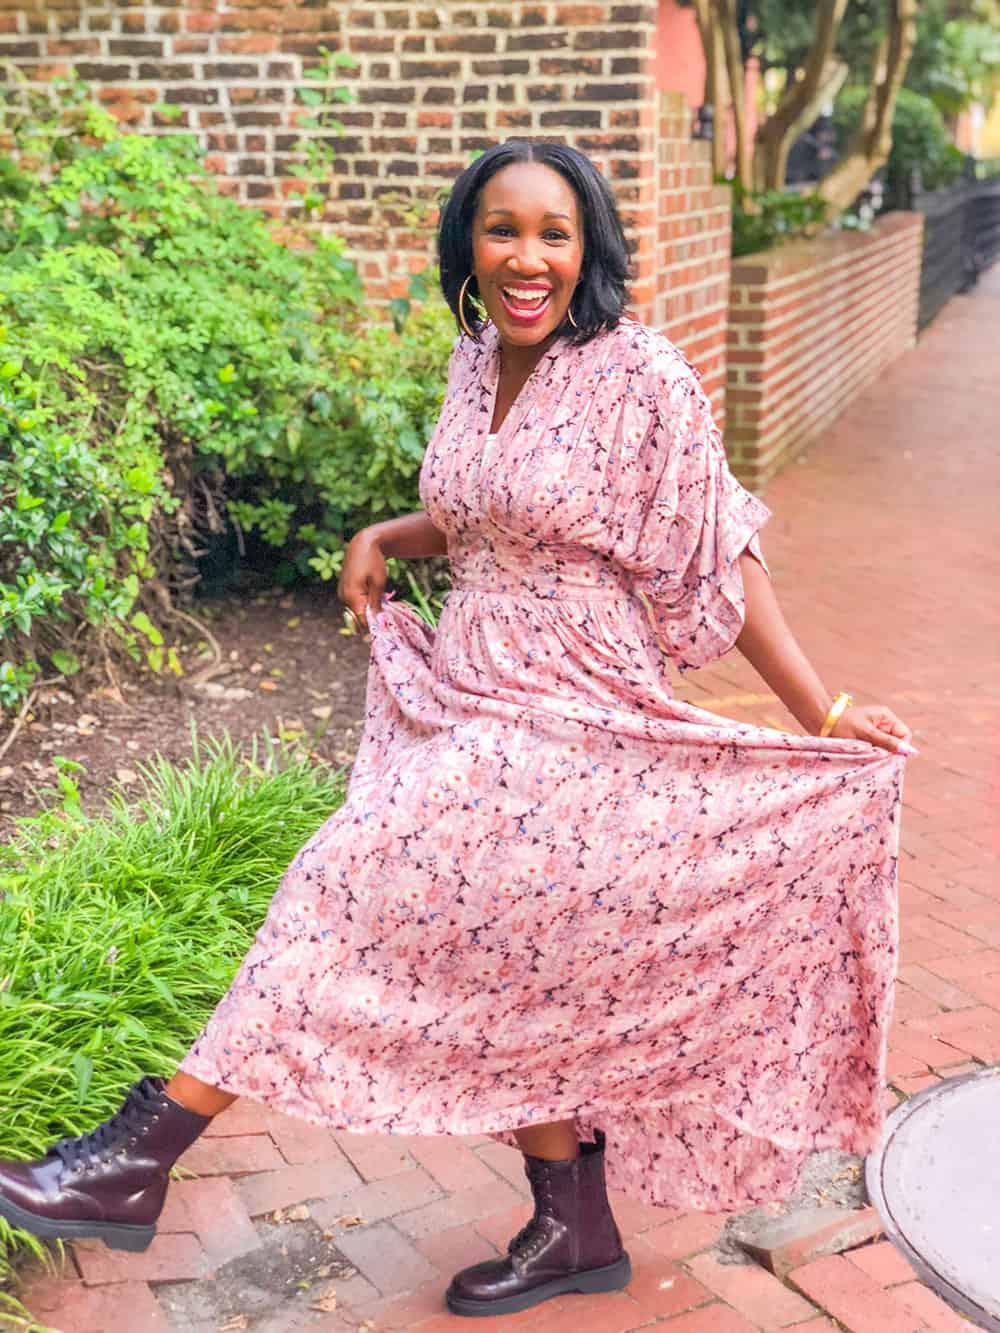 twirl in a floral dress